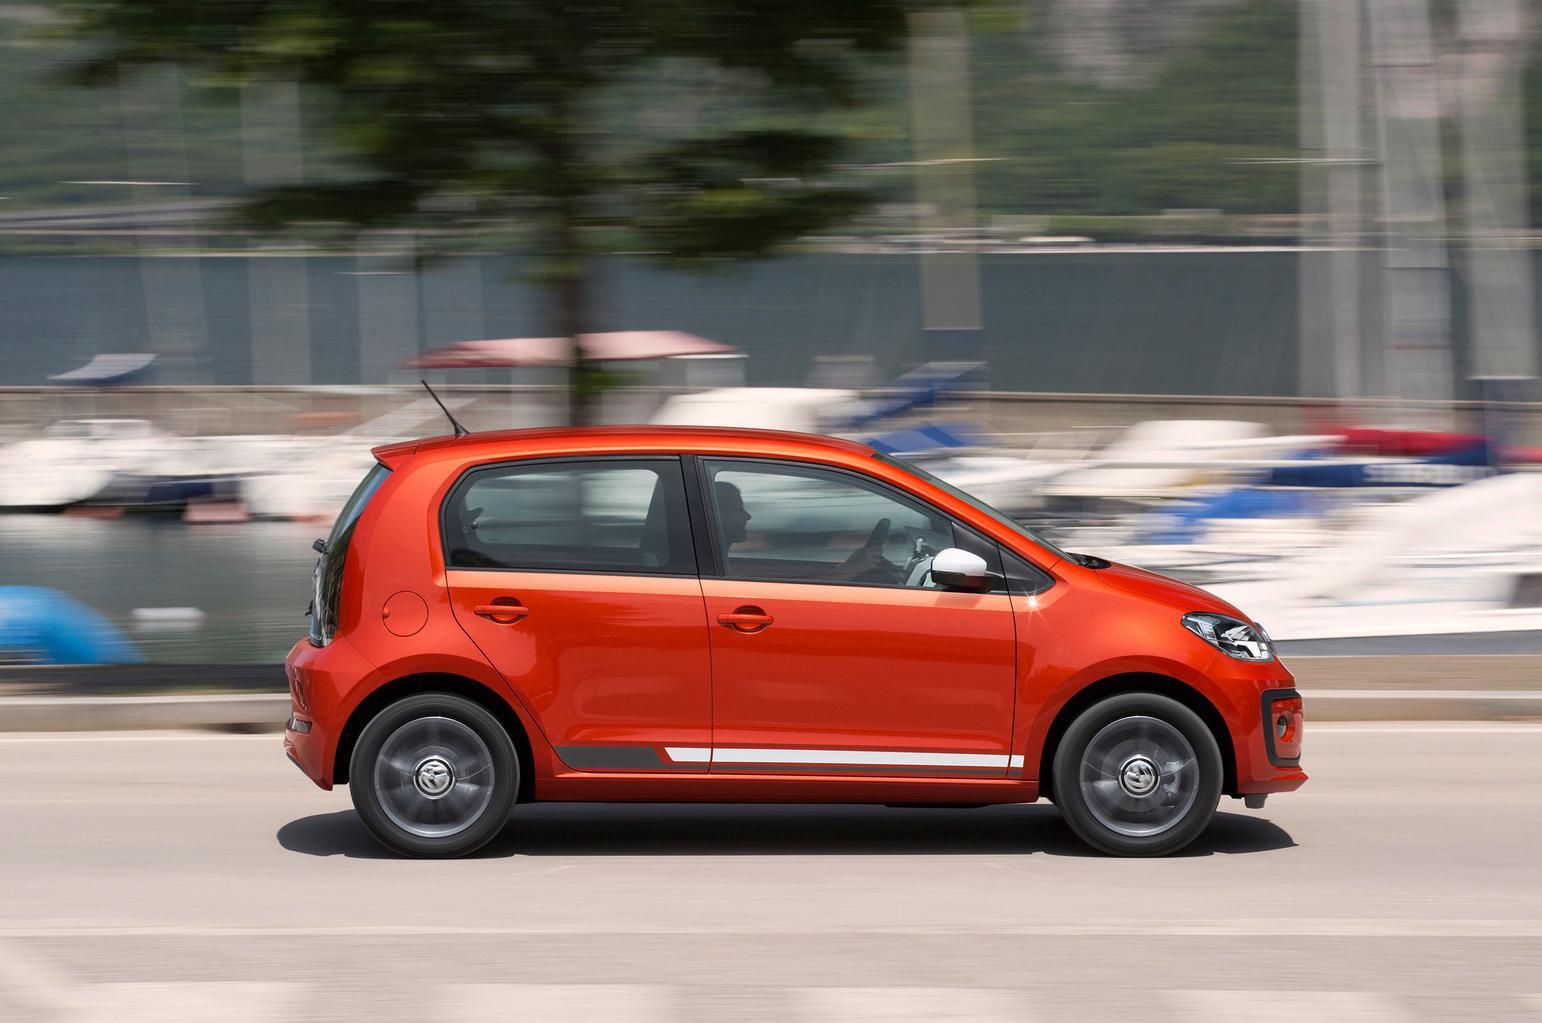 2016 Volkswagen Up 1.0 TSI review